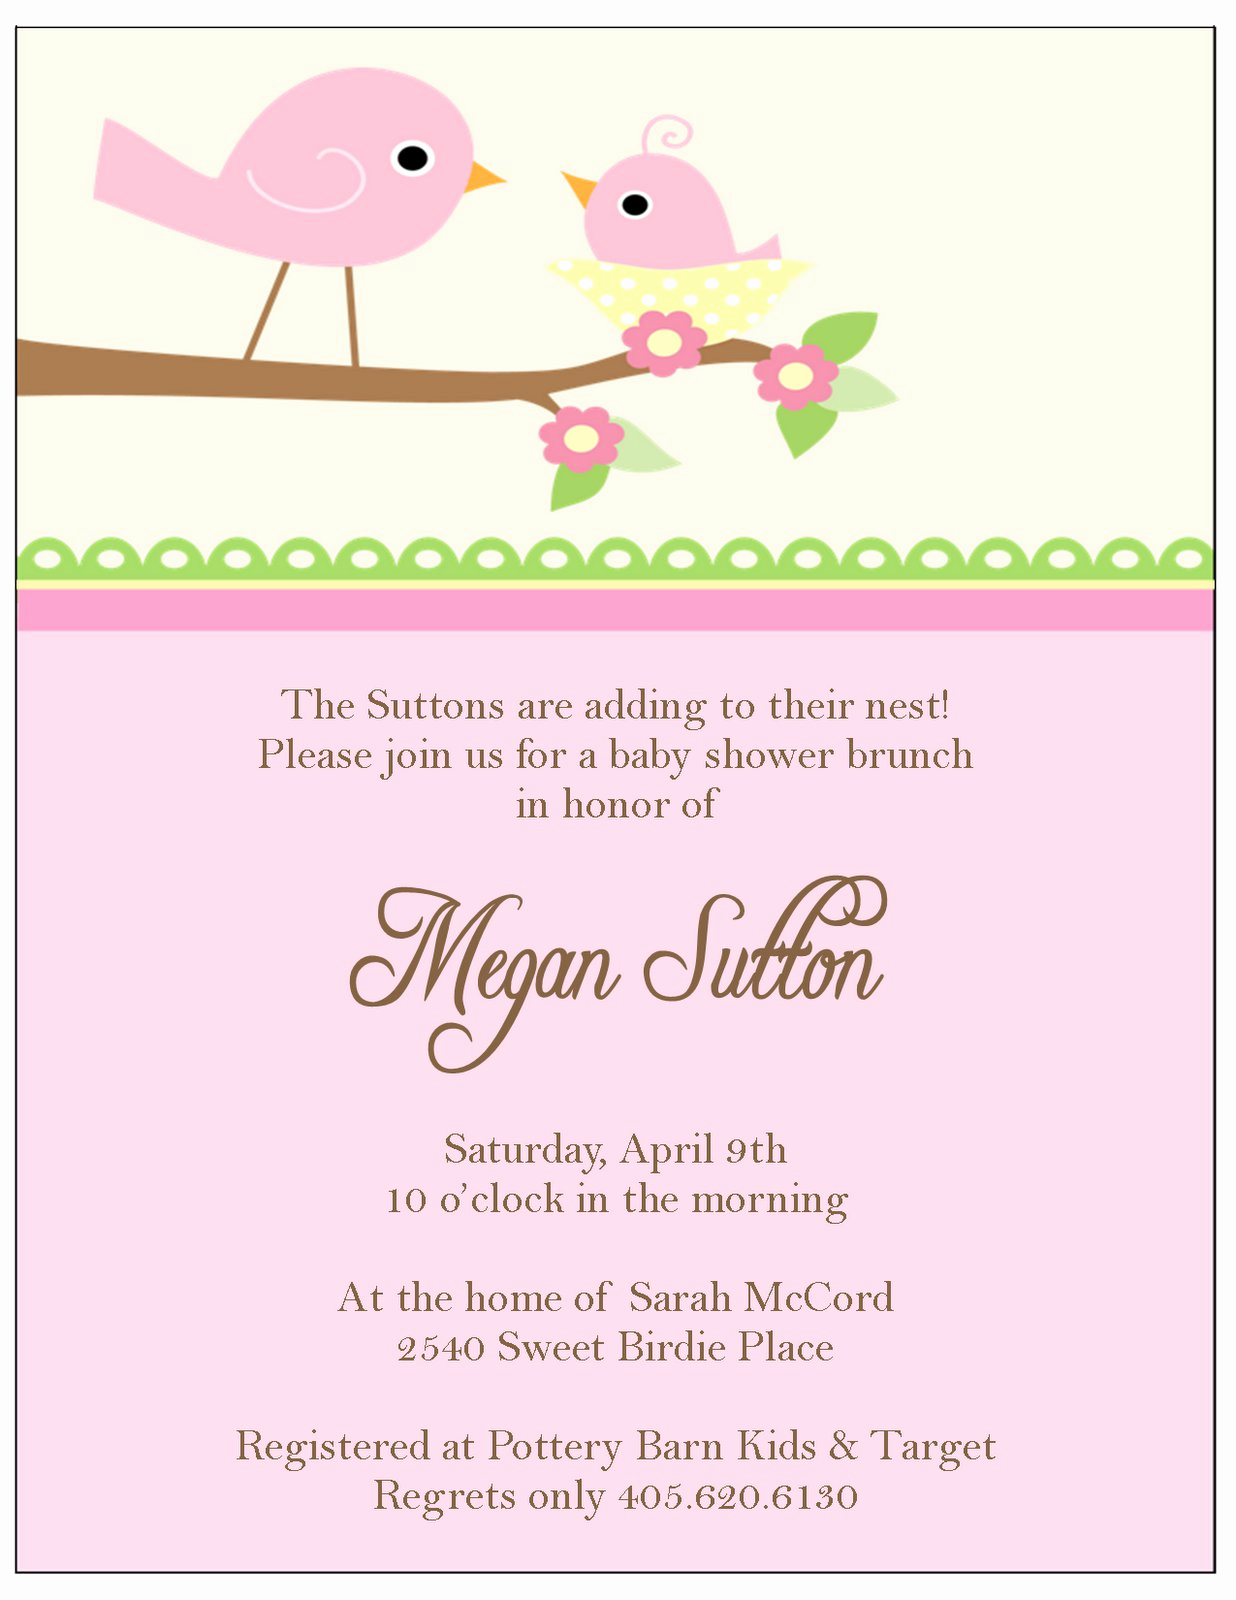 Free Baby Sprinkle Invitation Templates Awesome Birthday Invitation Mickey Mouse Birthday Invitations